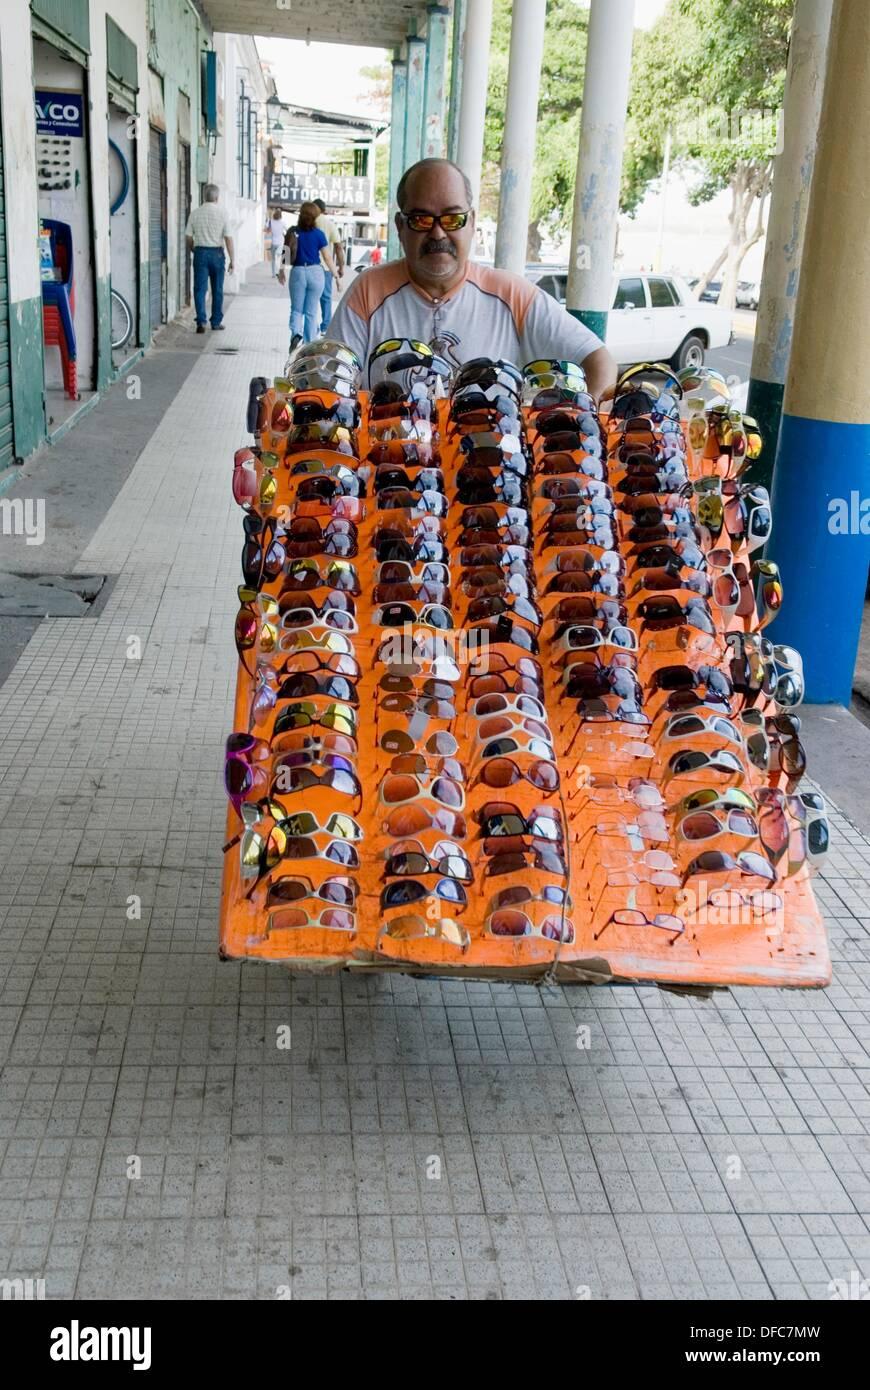 sunglass street seller,Ciudad Bolivar,Bolivarian Republic of Venezuela,South America - Stock Image